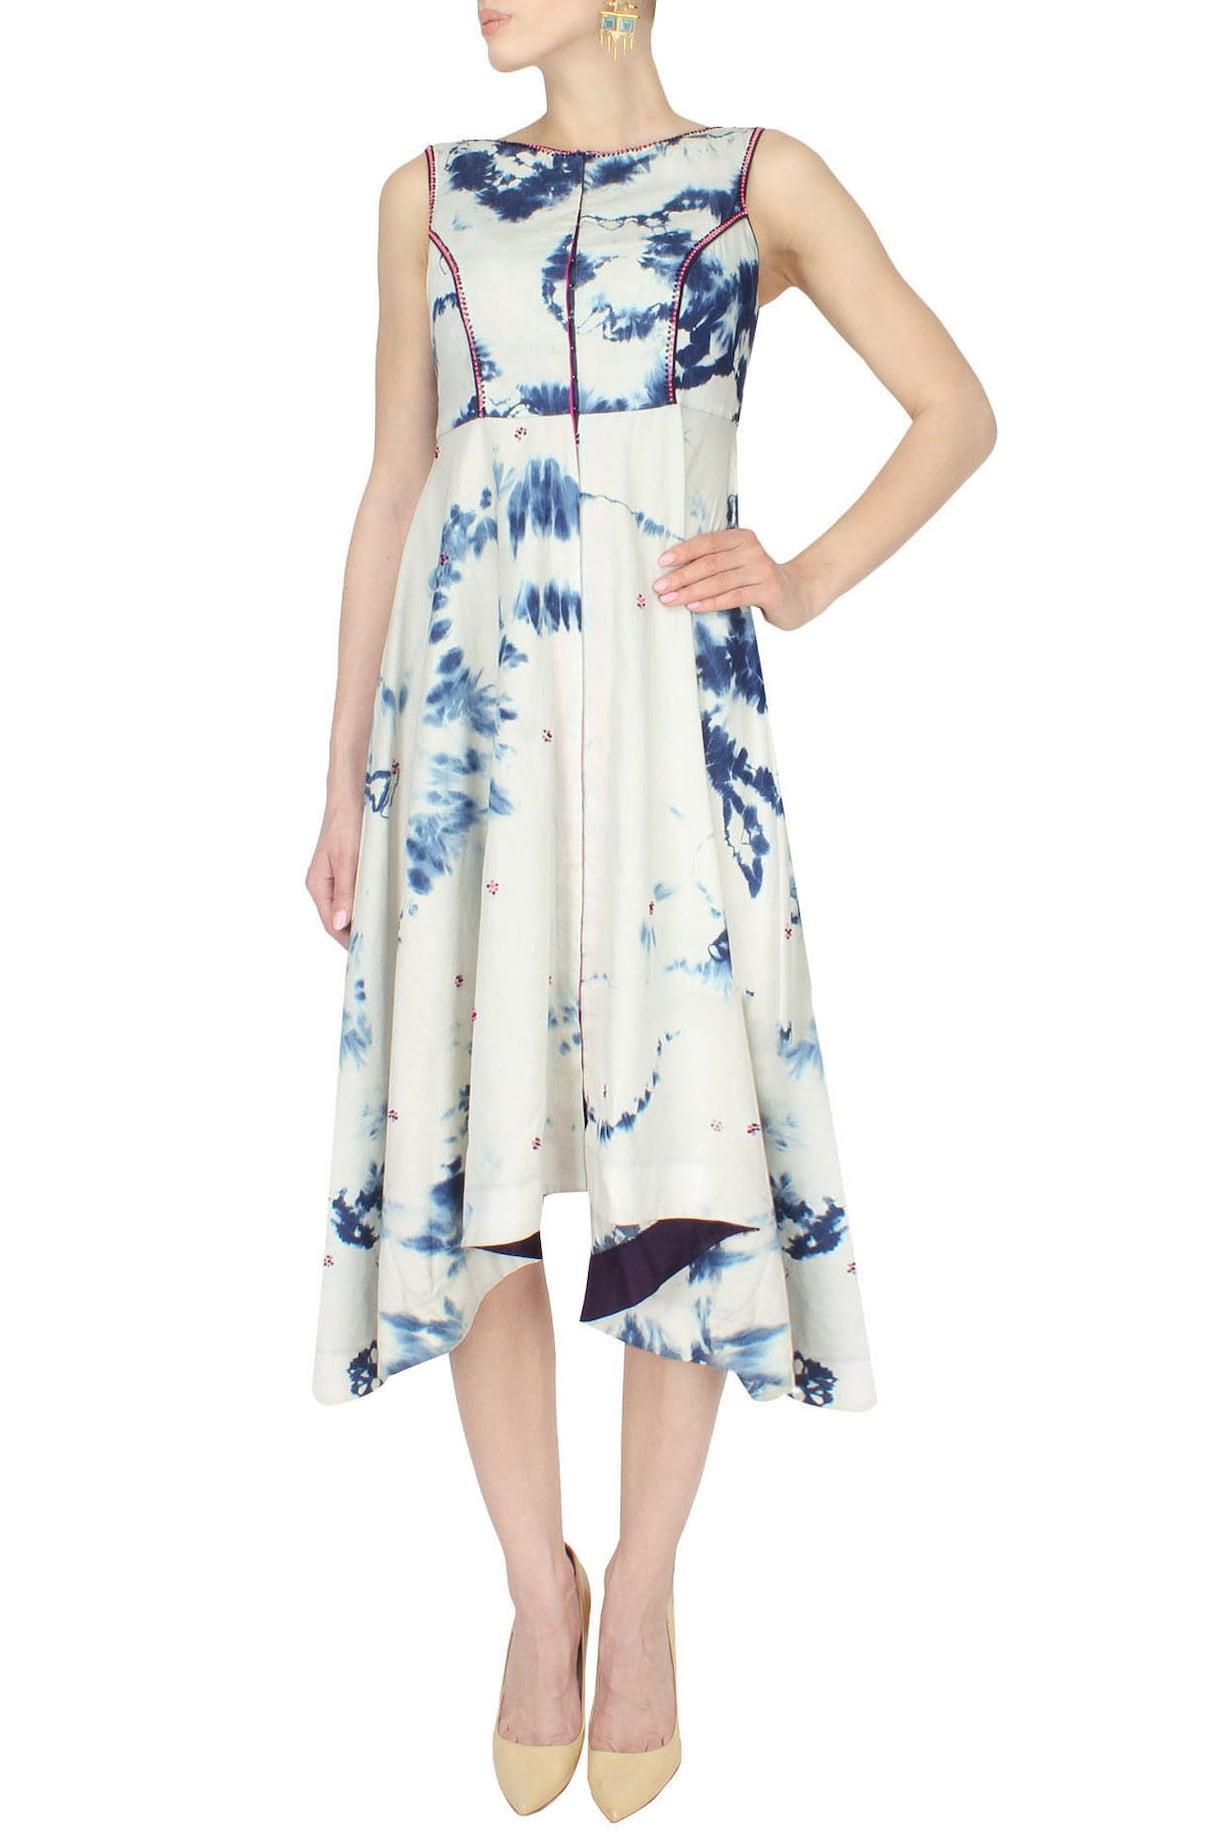 Anubha Jain Dresses